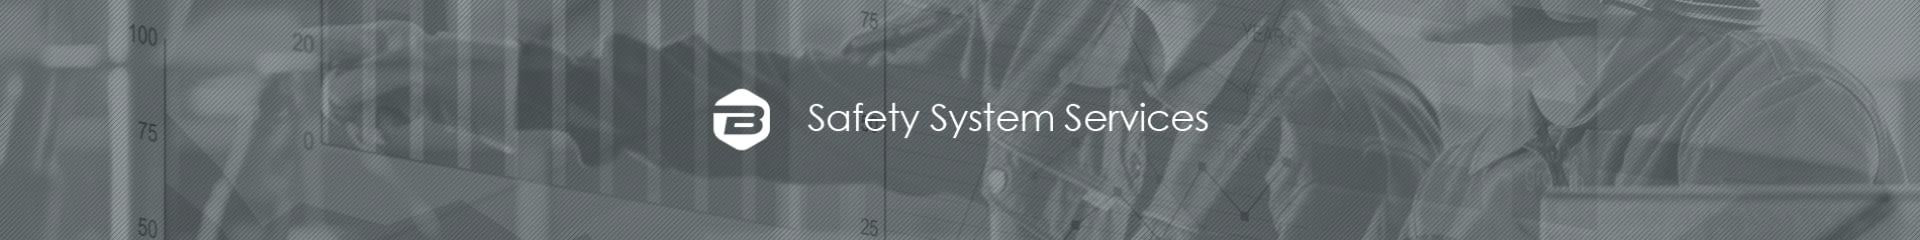 bulwark-safety-services-banner